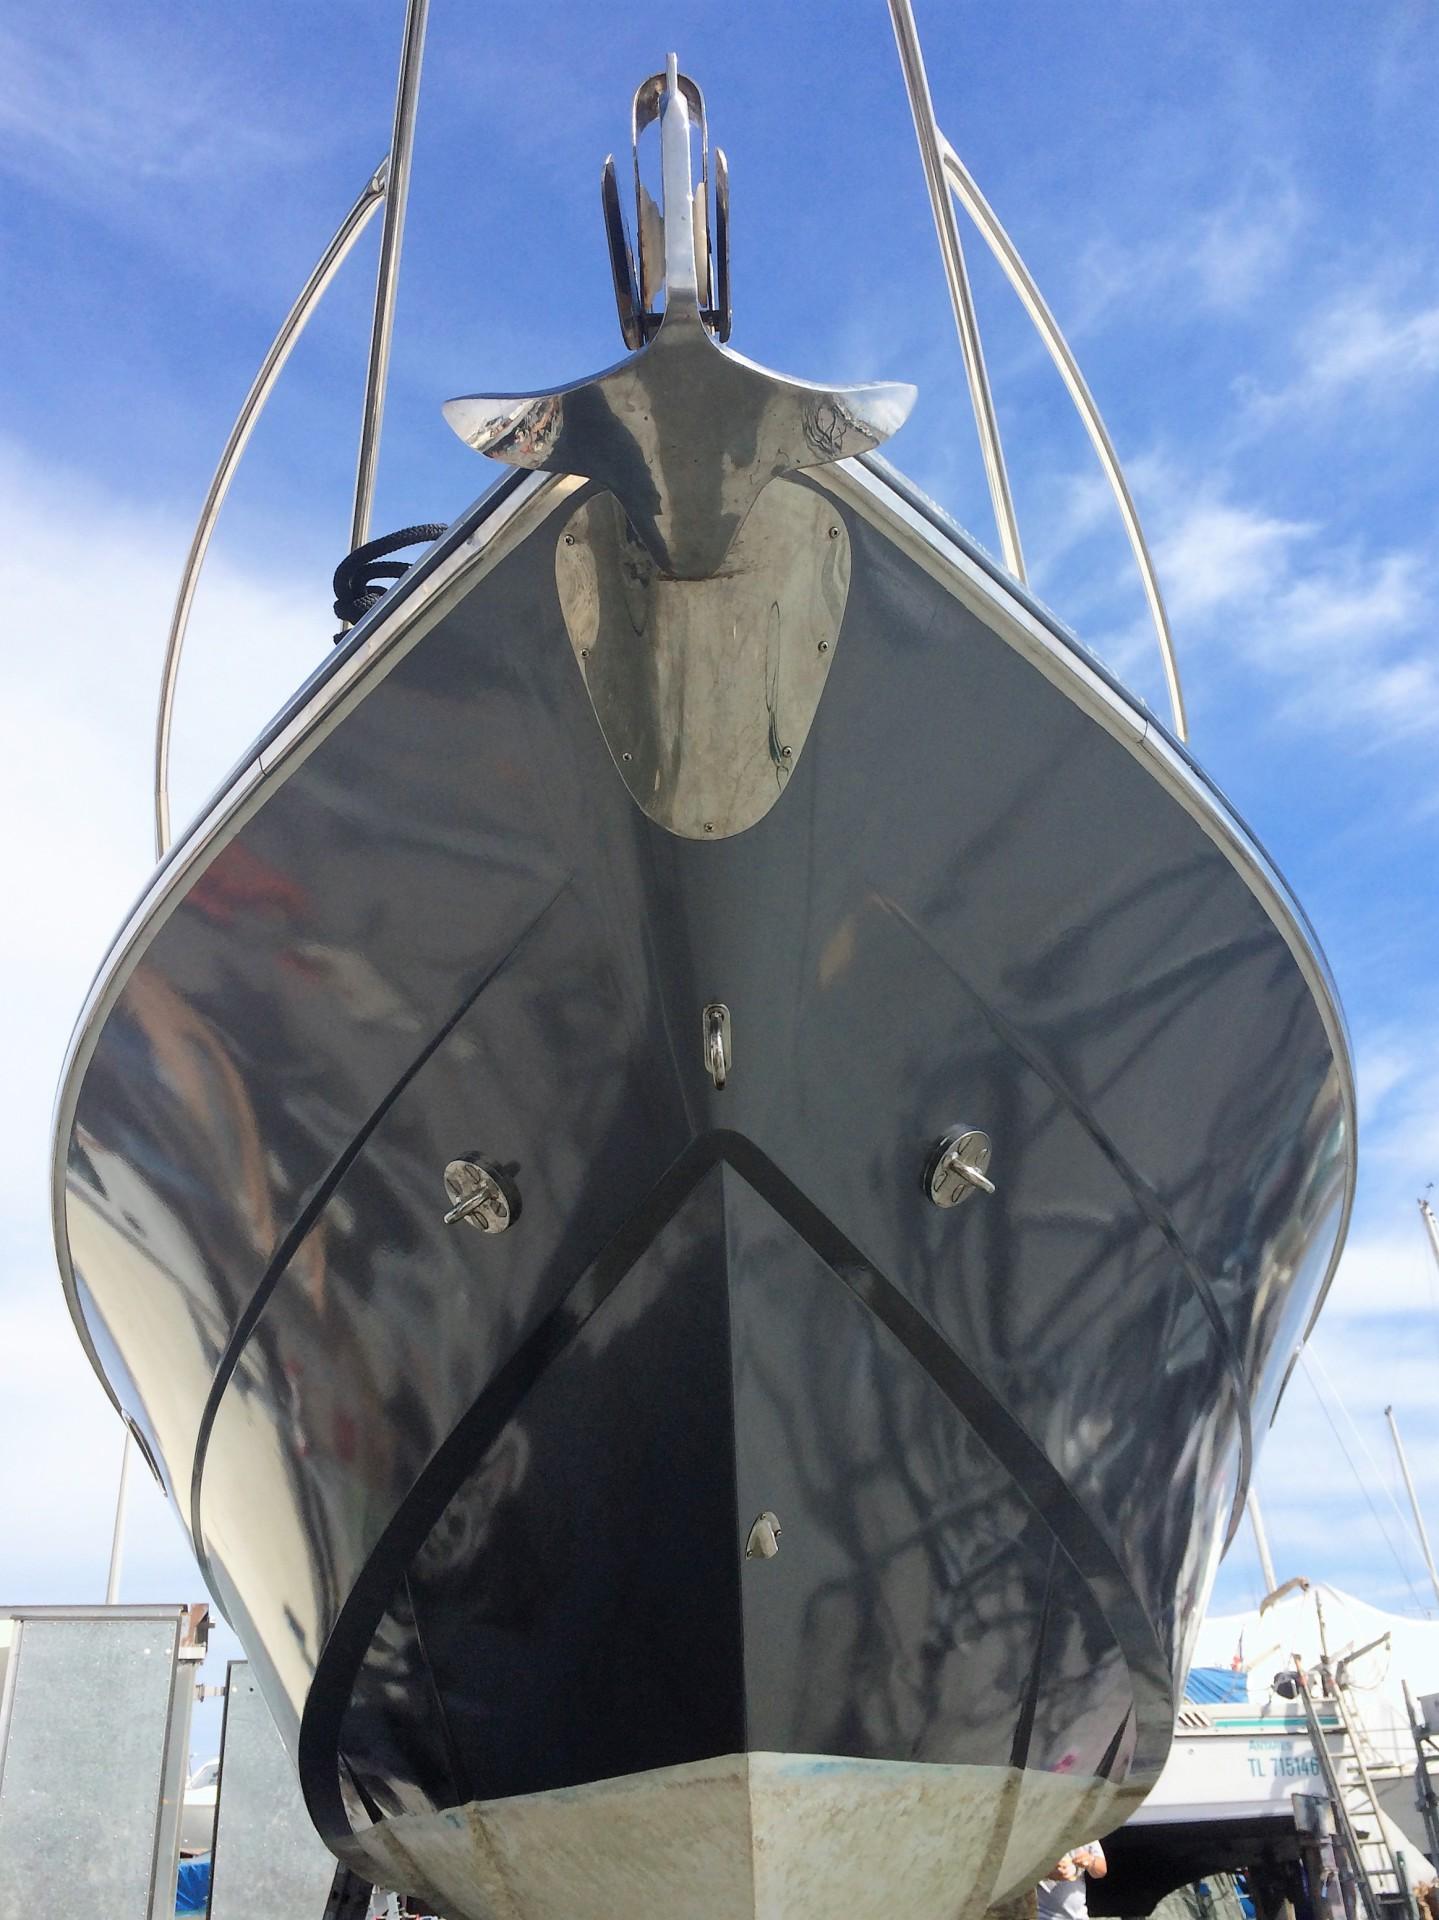 Yacht tender, hull vinyl wrap,3M